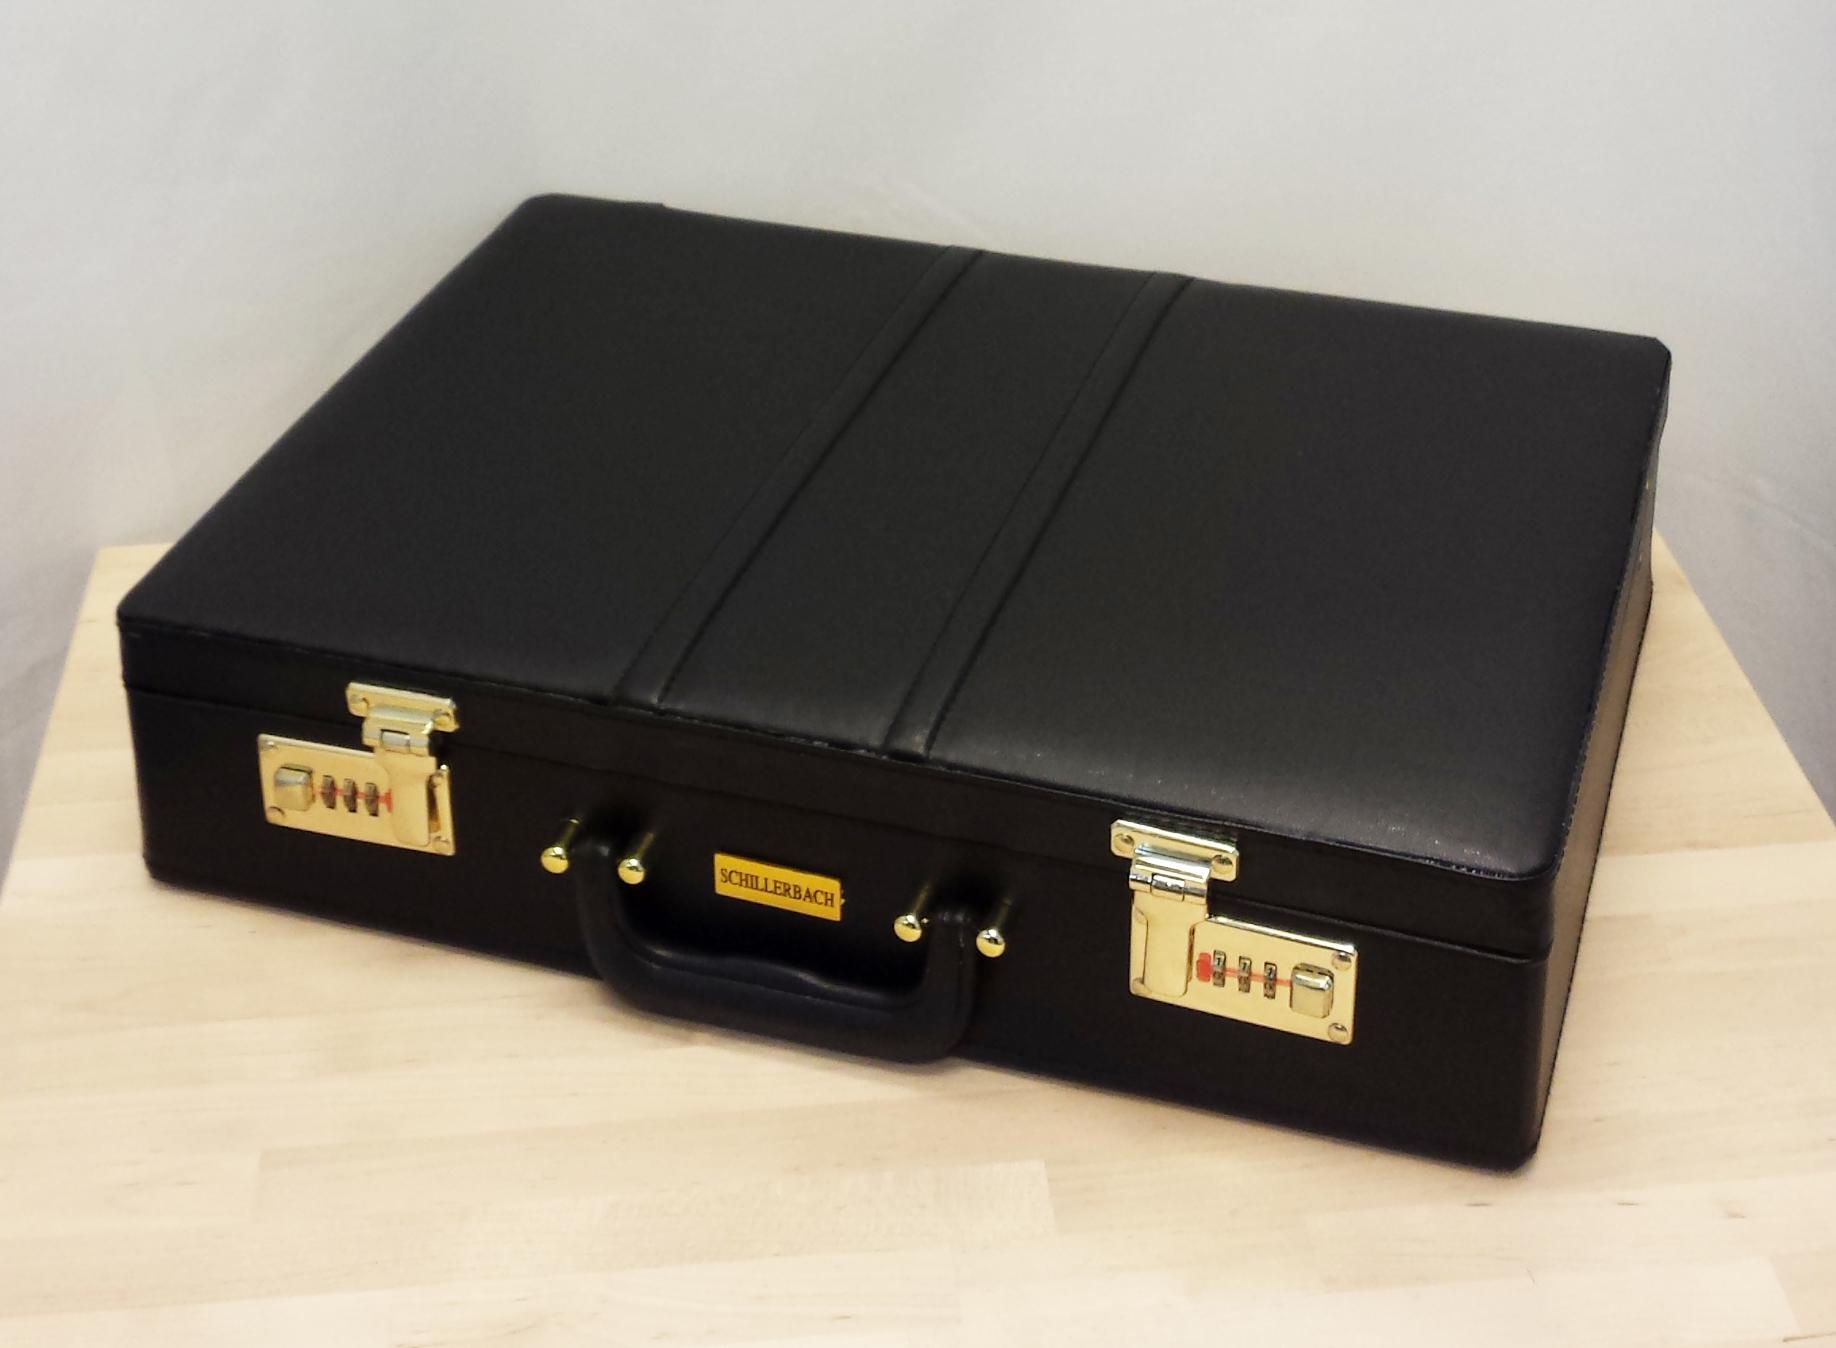 schillerbach besteckset besteck 72 tlg koffer tafelbesteck. Black Bedroom Furniture Sets. Home Design Ideas